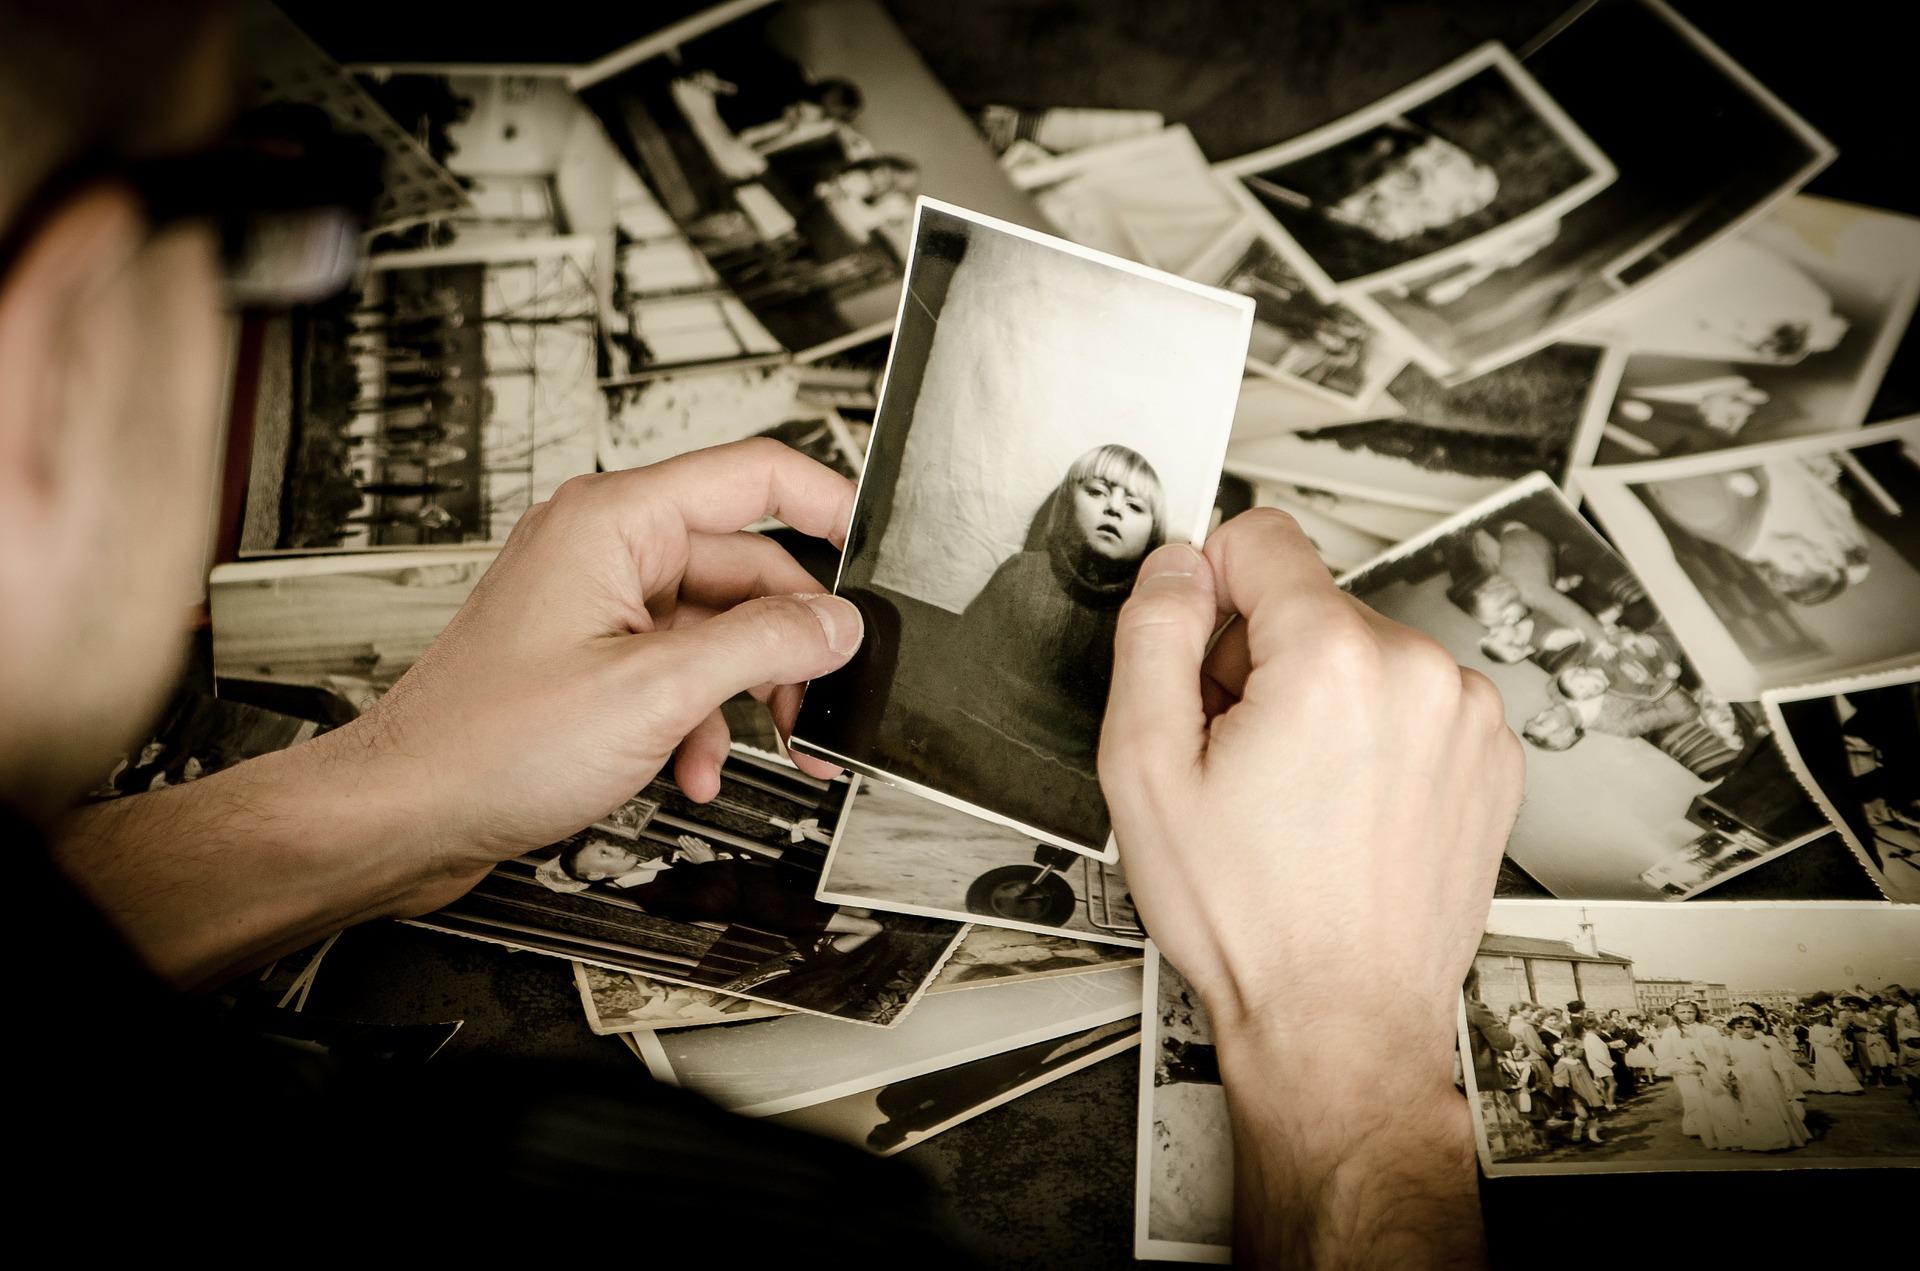 pellicola - Foto di Michal Jarmoluk da Pixabay